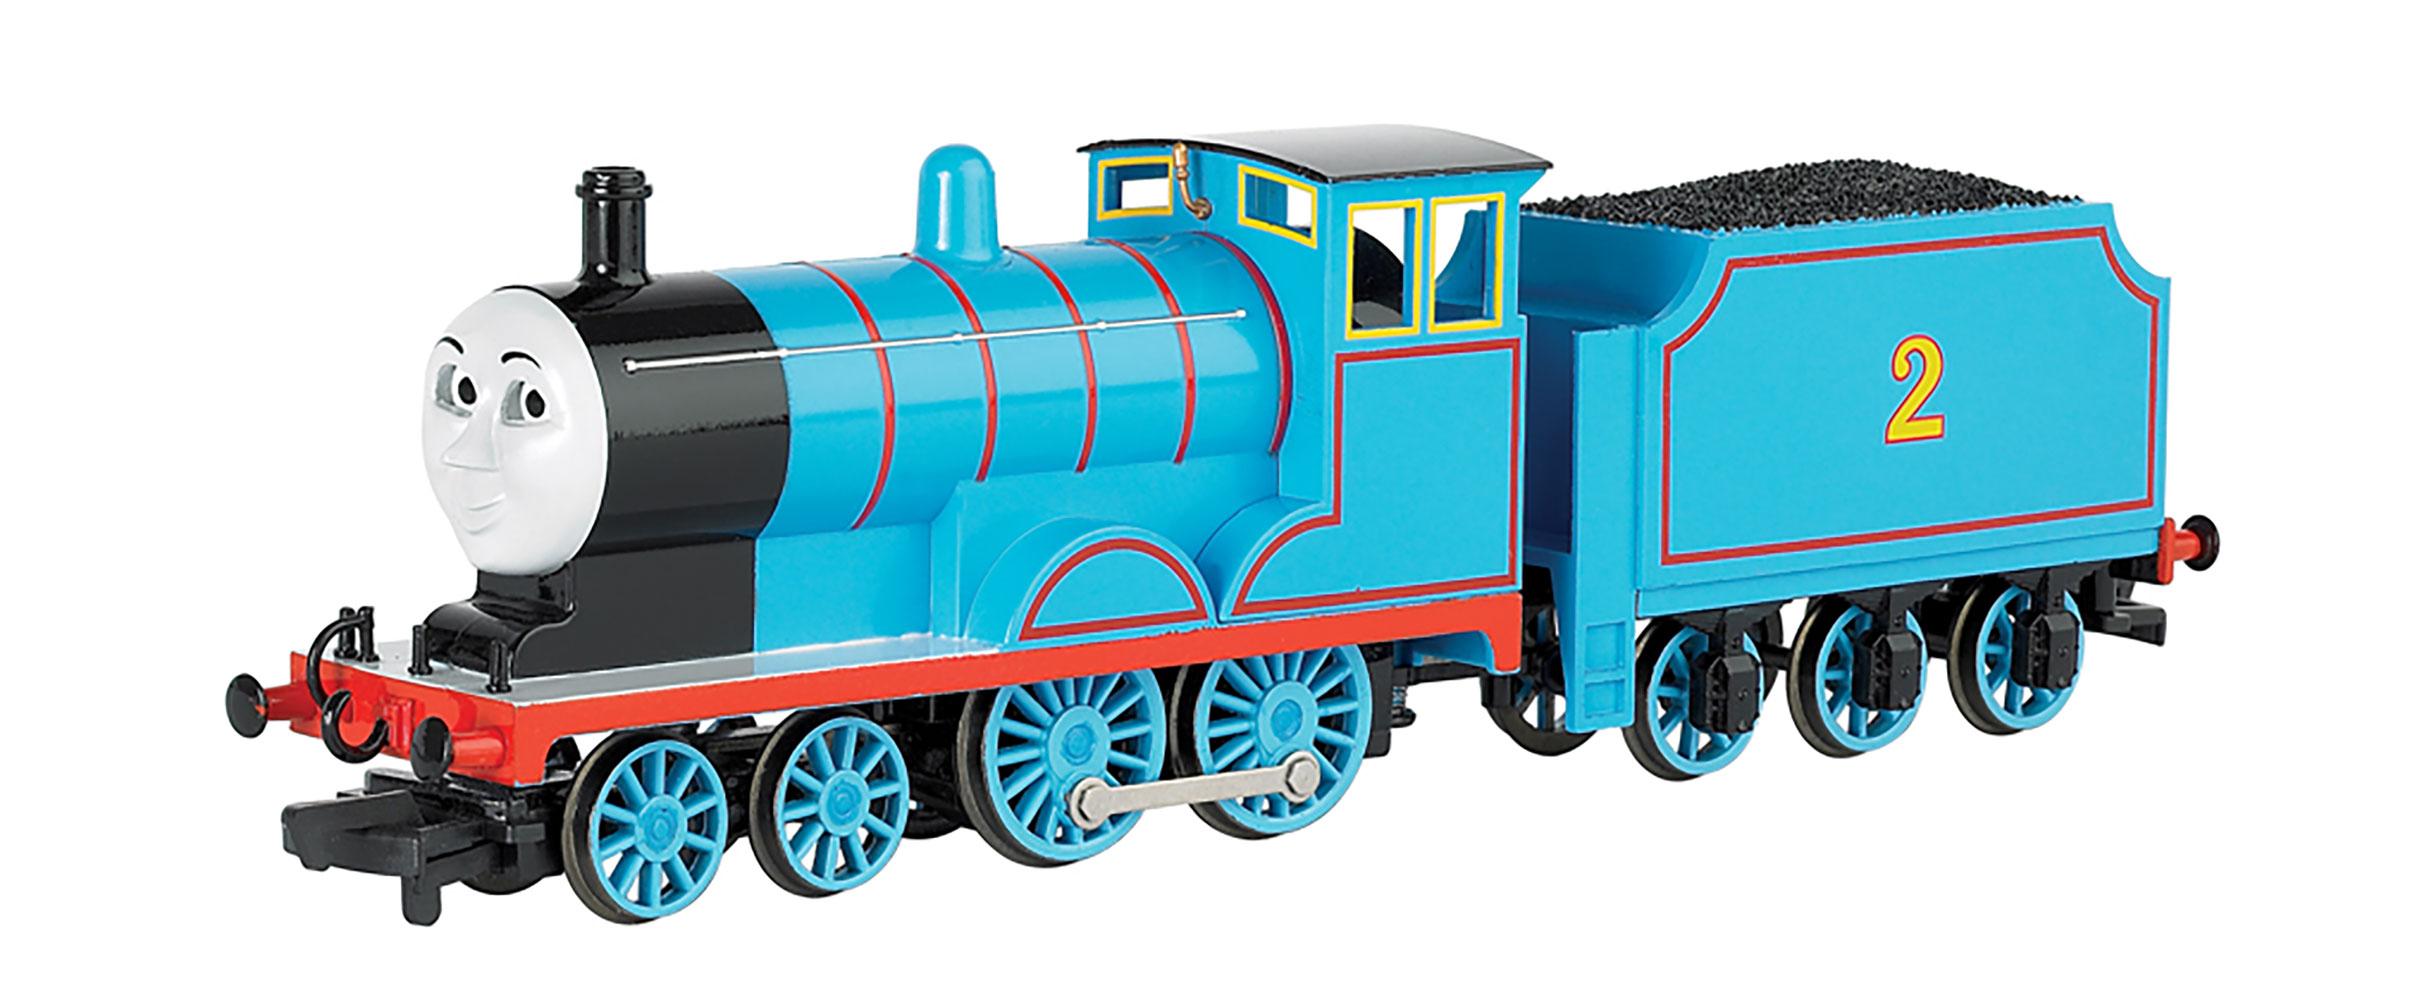 Bachmann Trains Thomas And Friends Edward Locomotive Engine with Moving Eyes | eBay